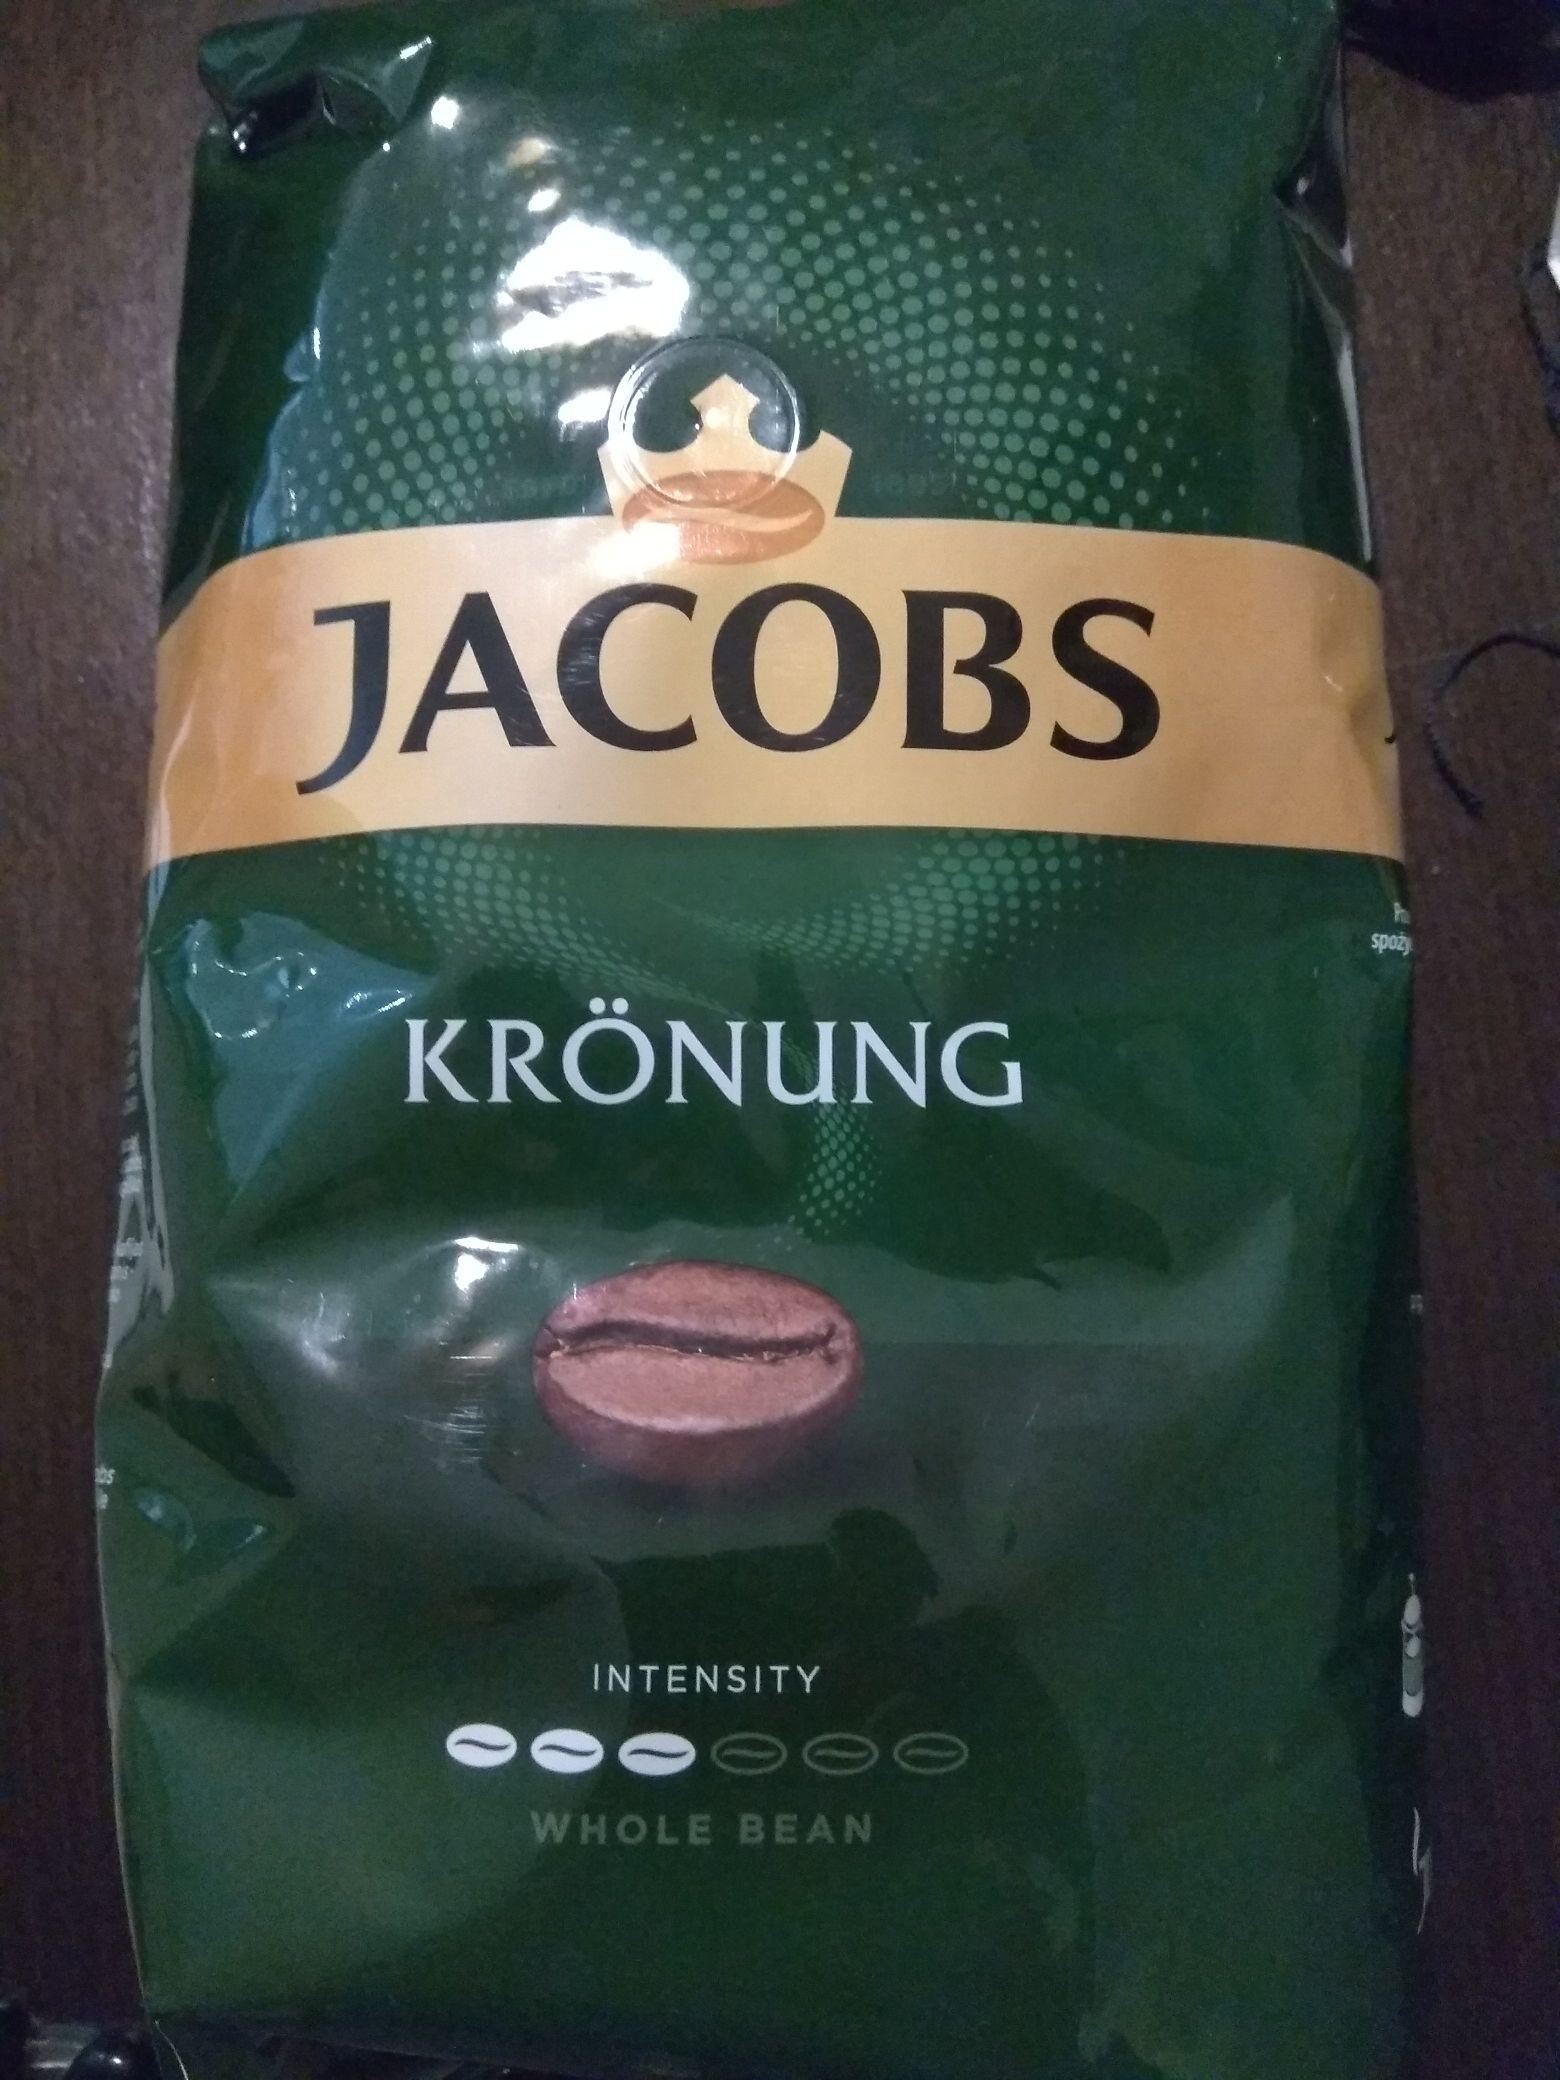 Jacob's kronung 1kg ziarnista 34.99 zł Lidl